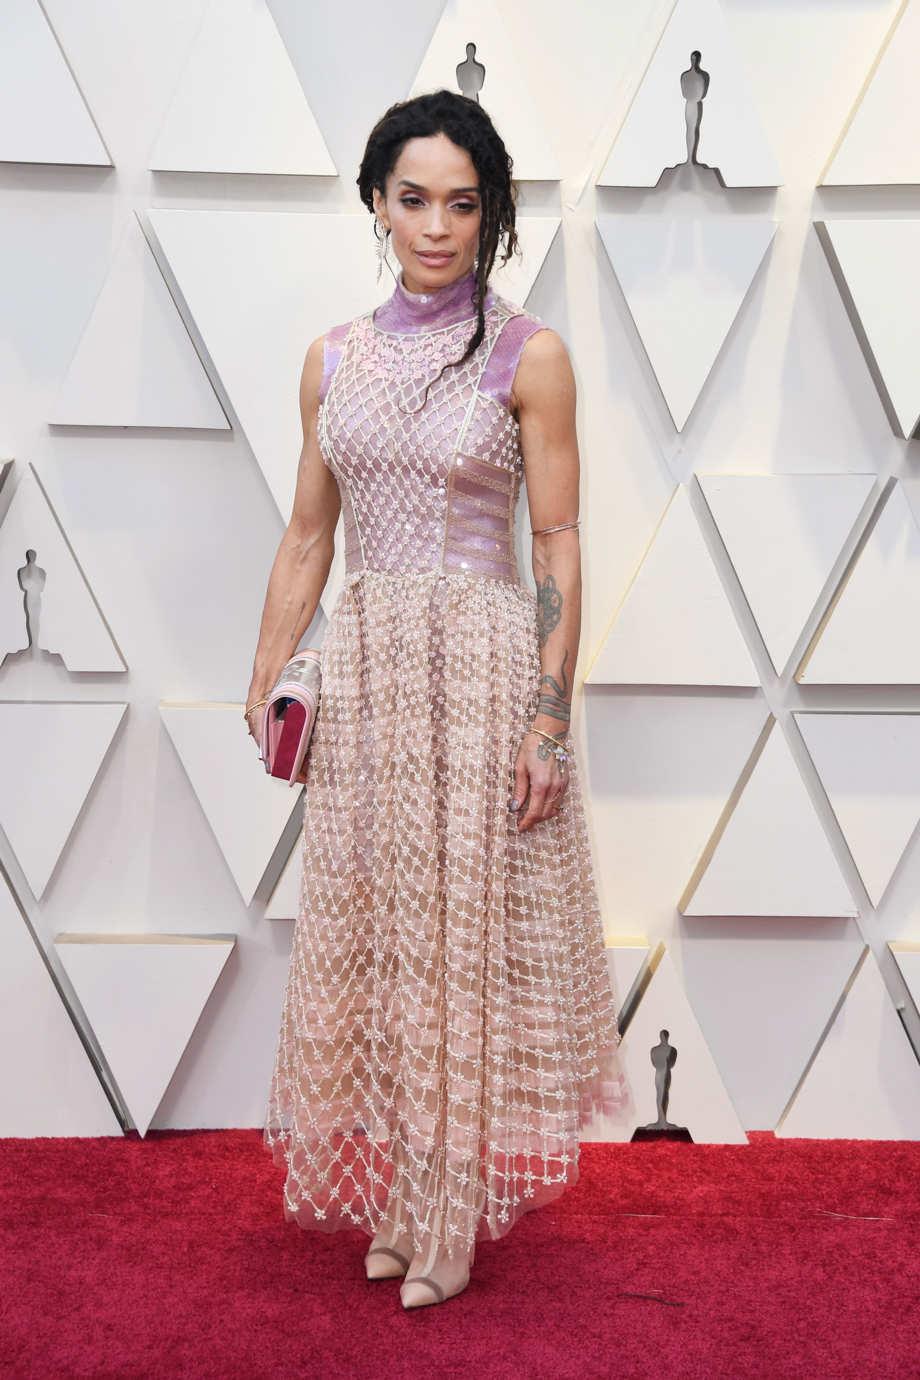 Lisa Bonet - Fendi Couture - Frazer Harrison Getty .jpg